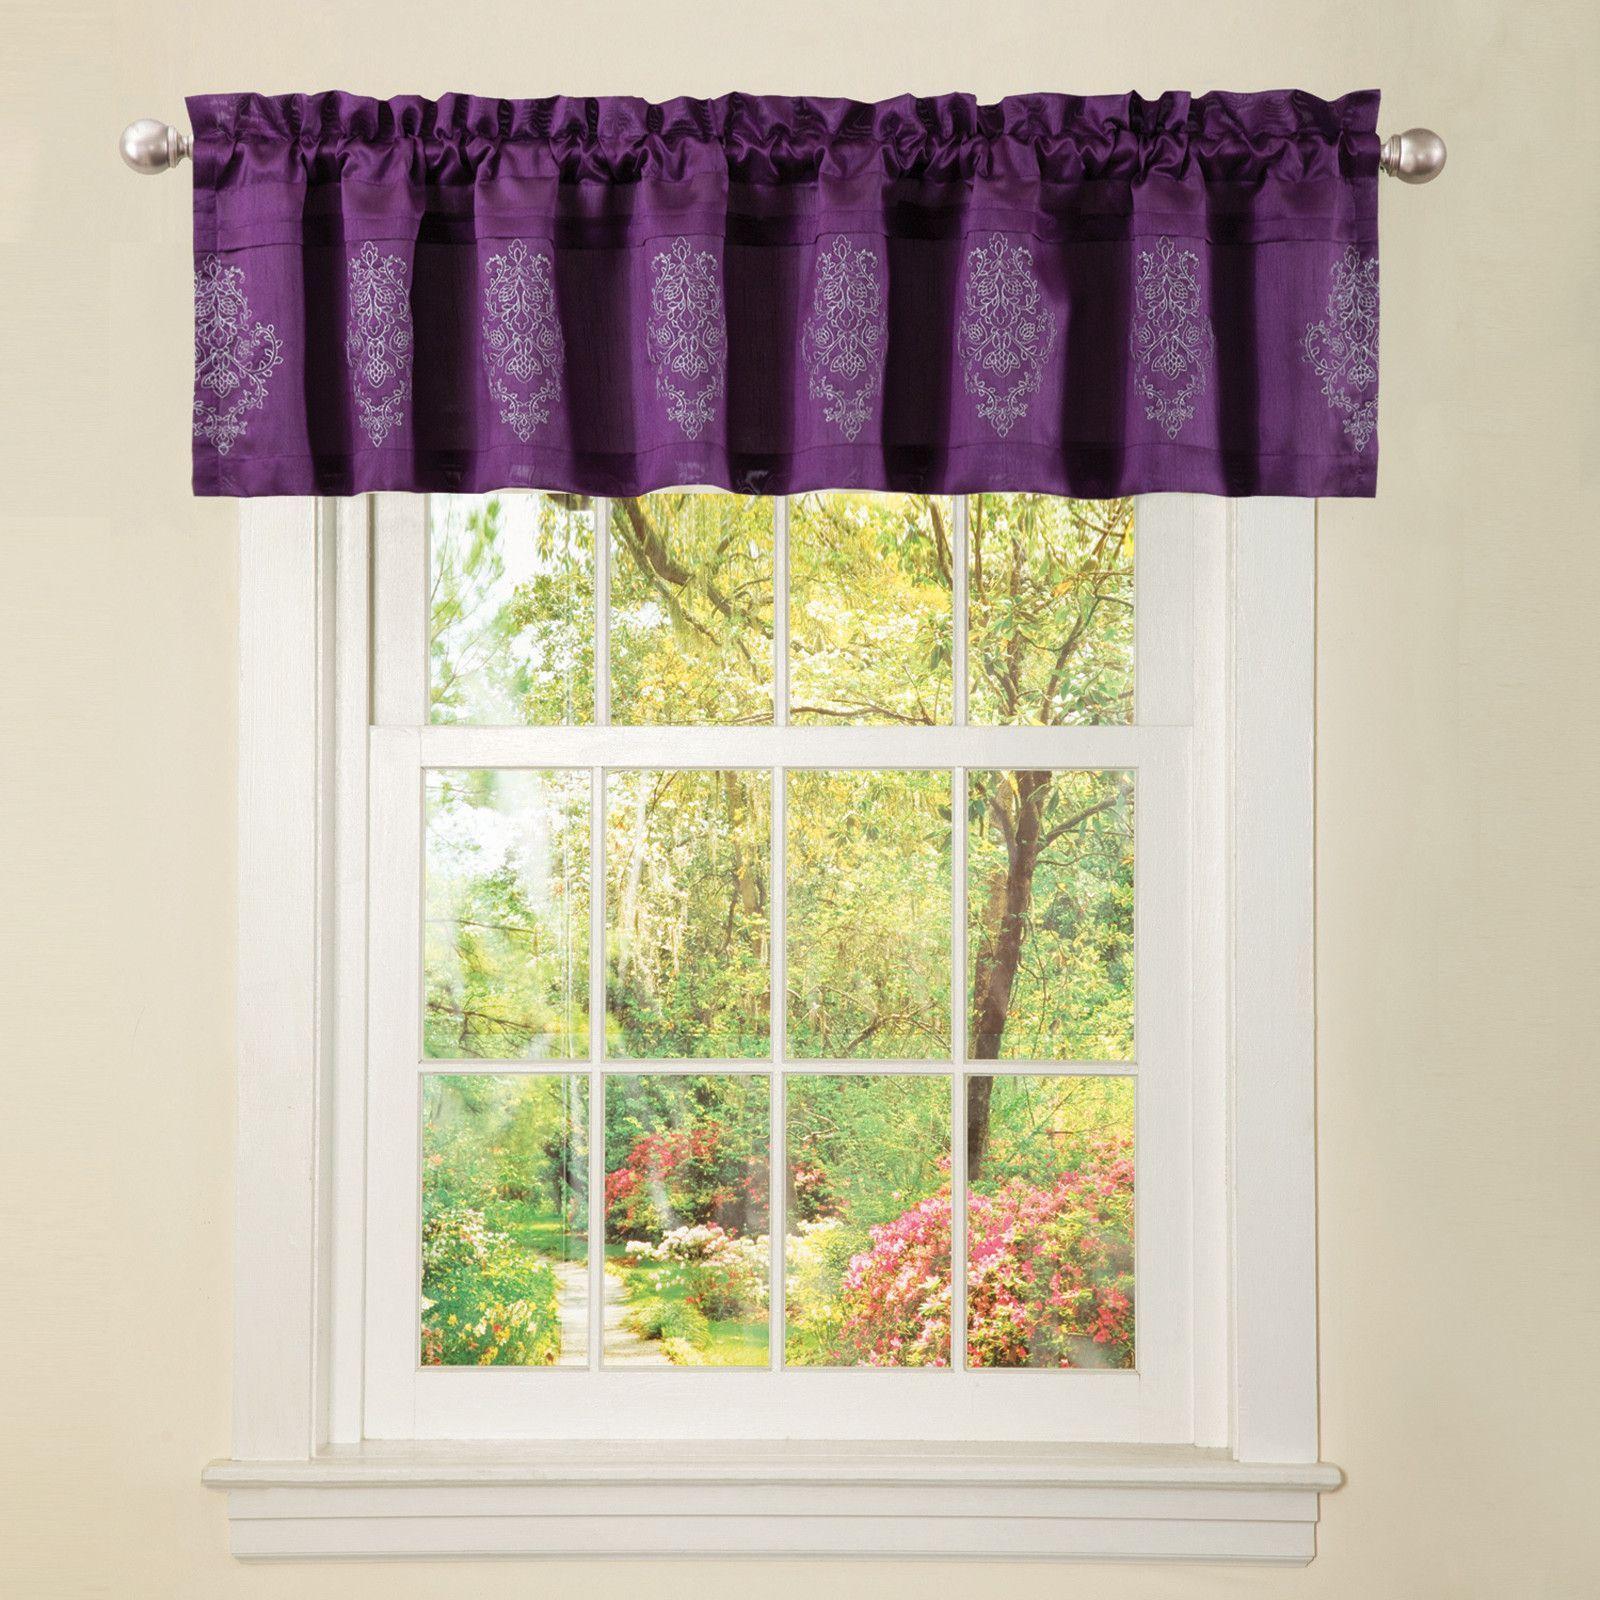 delila plum valance decorating pinterest valance cottage rh pinterest com cottage style window valances